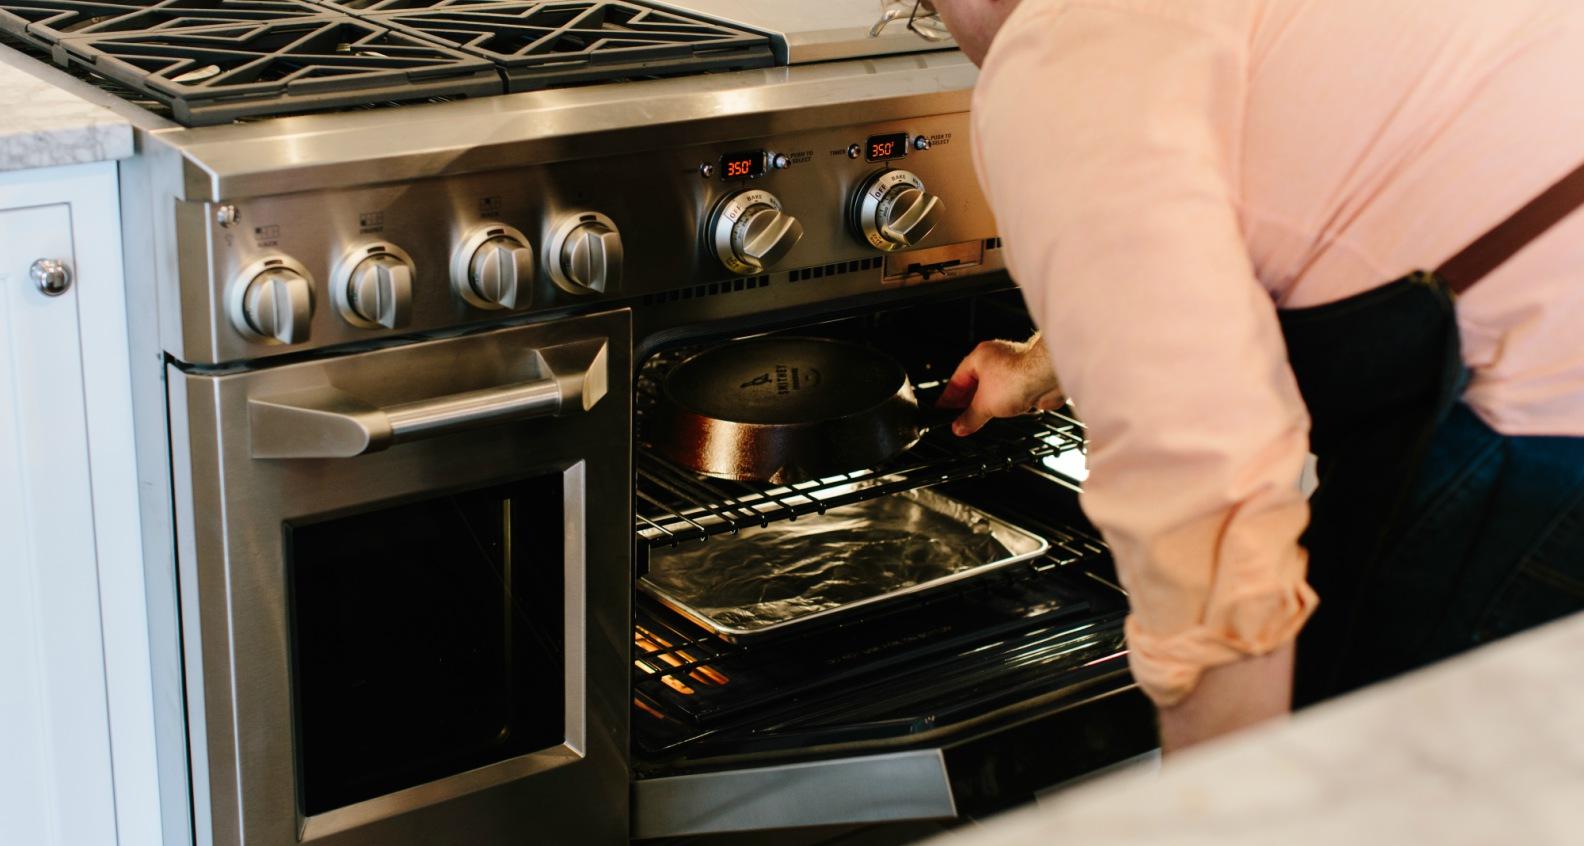 Baking skillet in oven